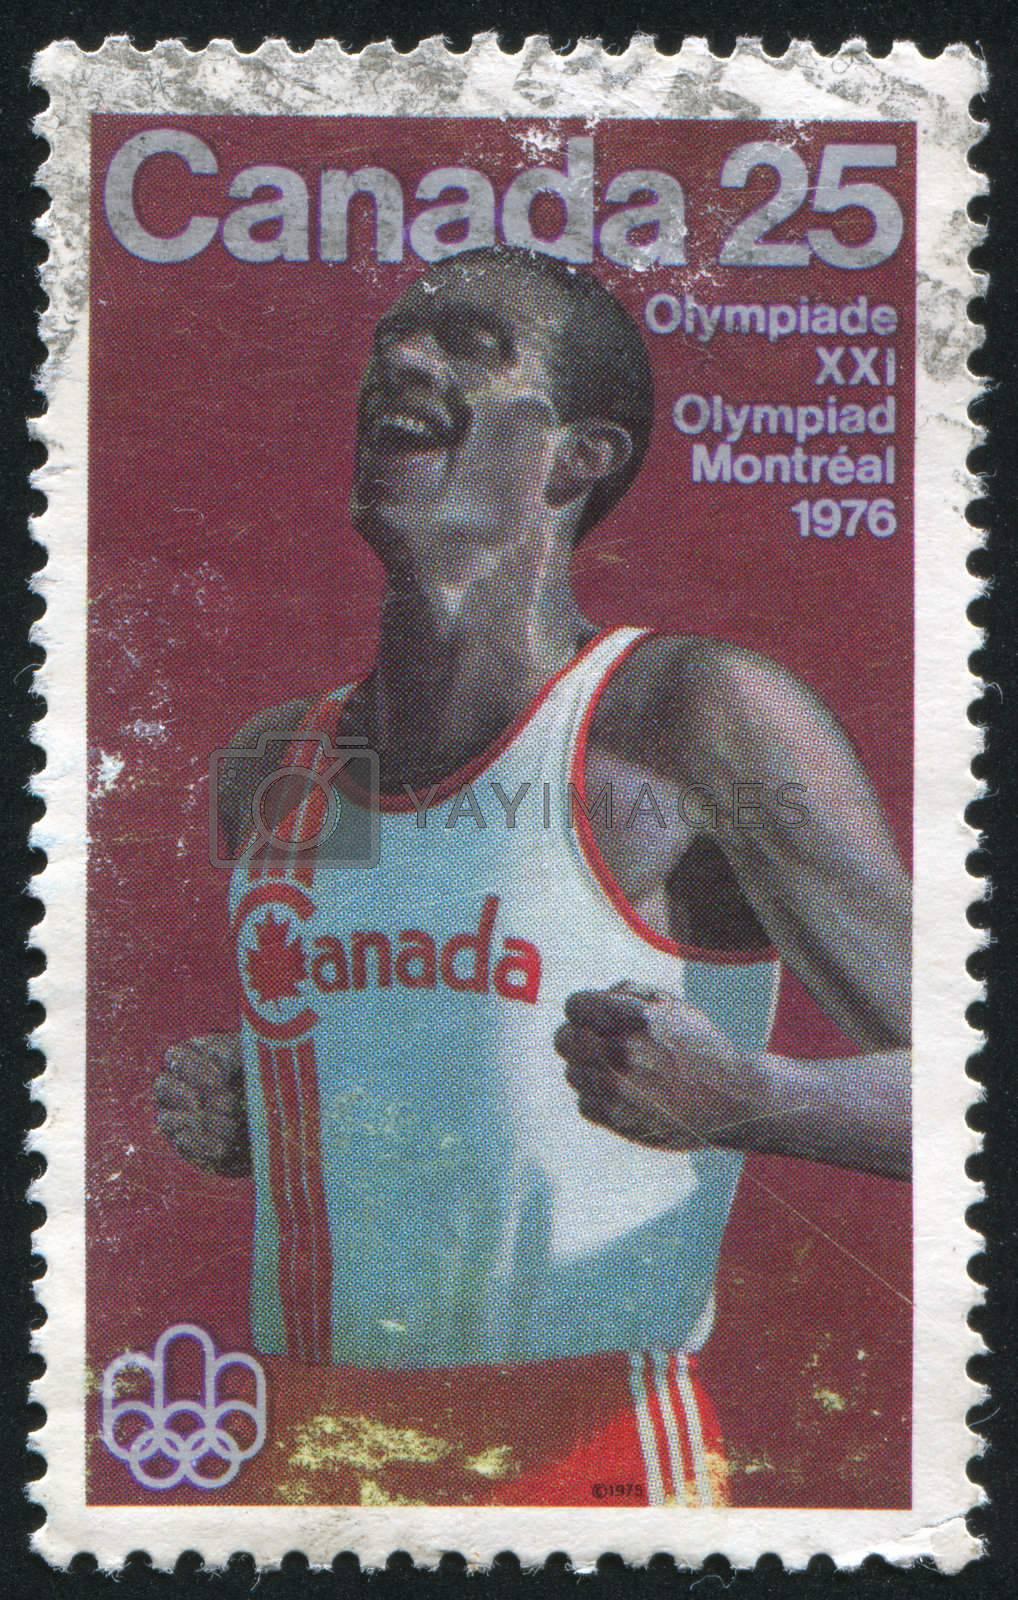 CANADA - CIRCA 1975: stamp printed by Canada, shows Marathon running, circa 1975